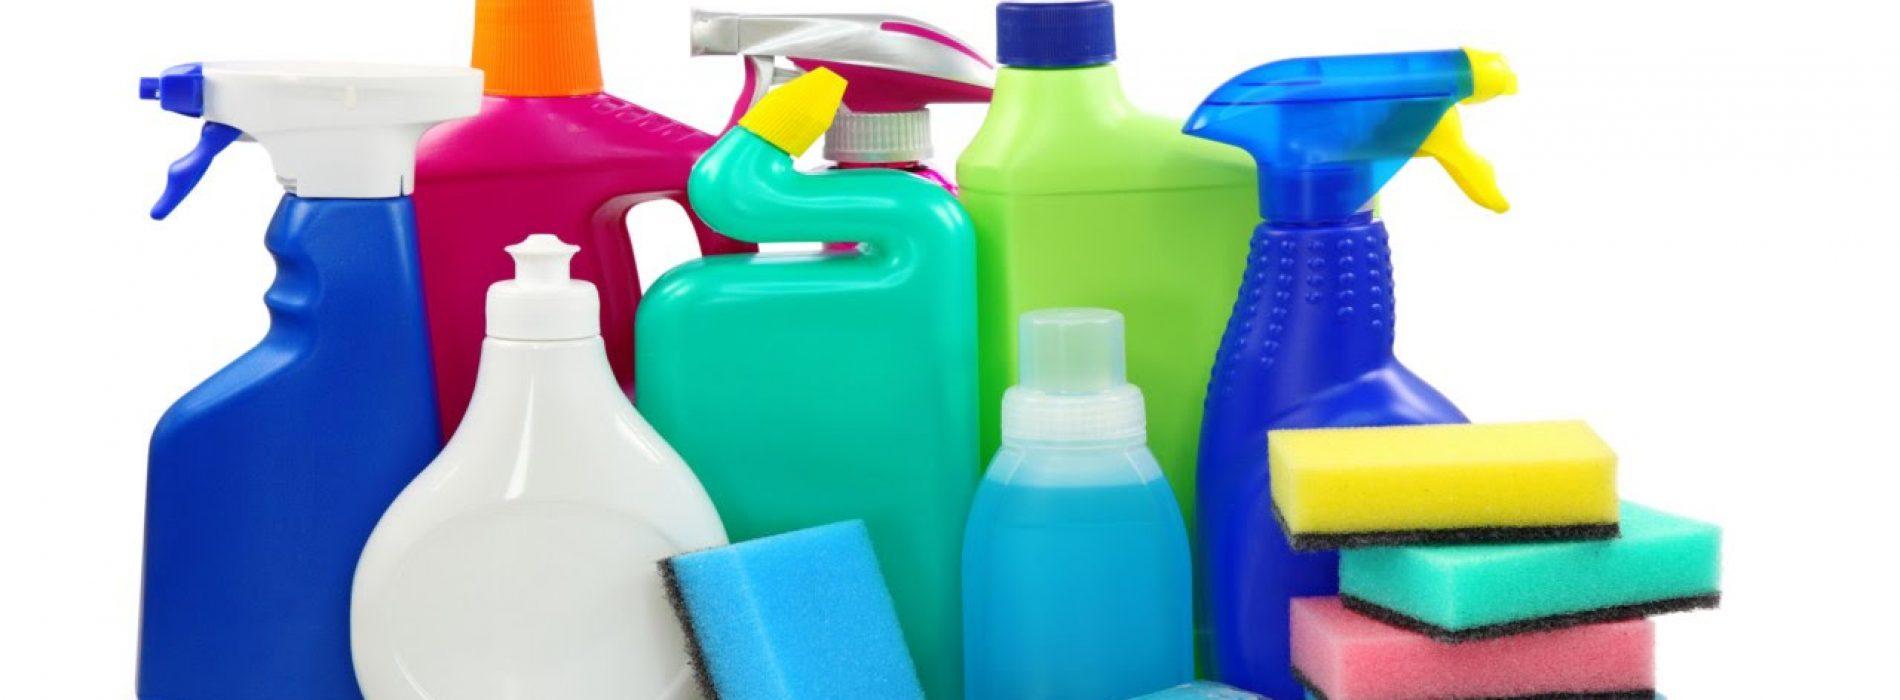 Economia aquecida estimulará vendas de produtos de limpeza